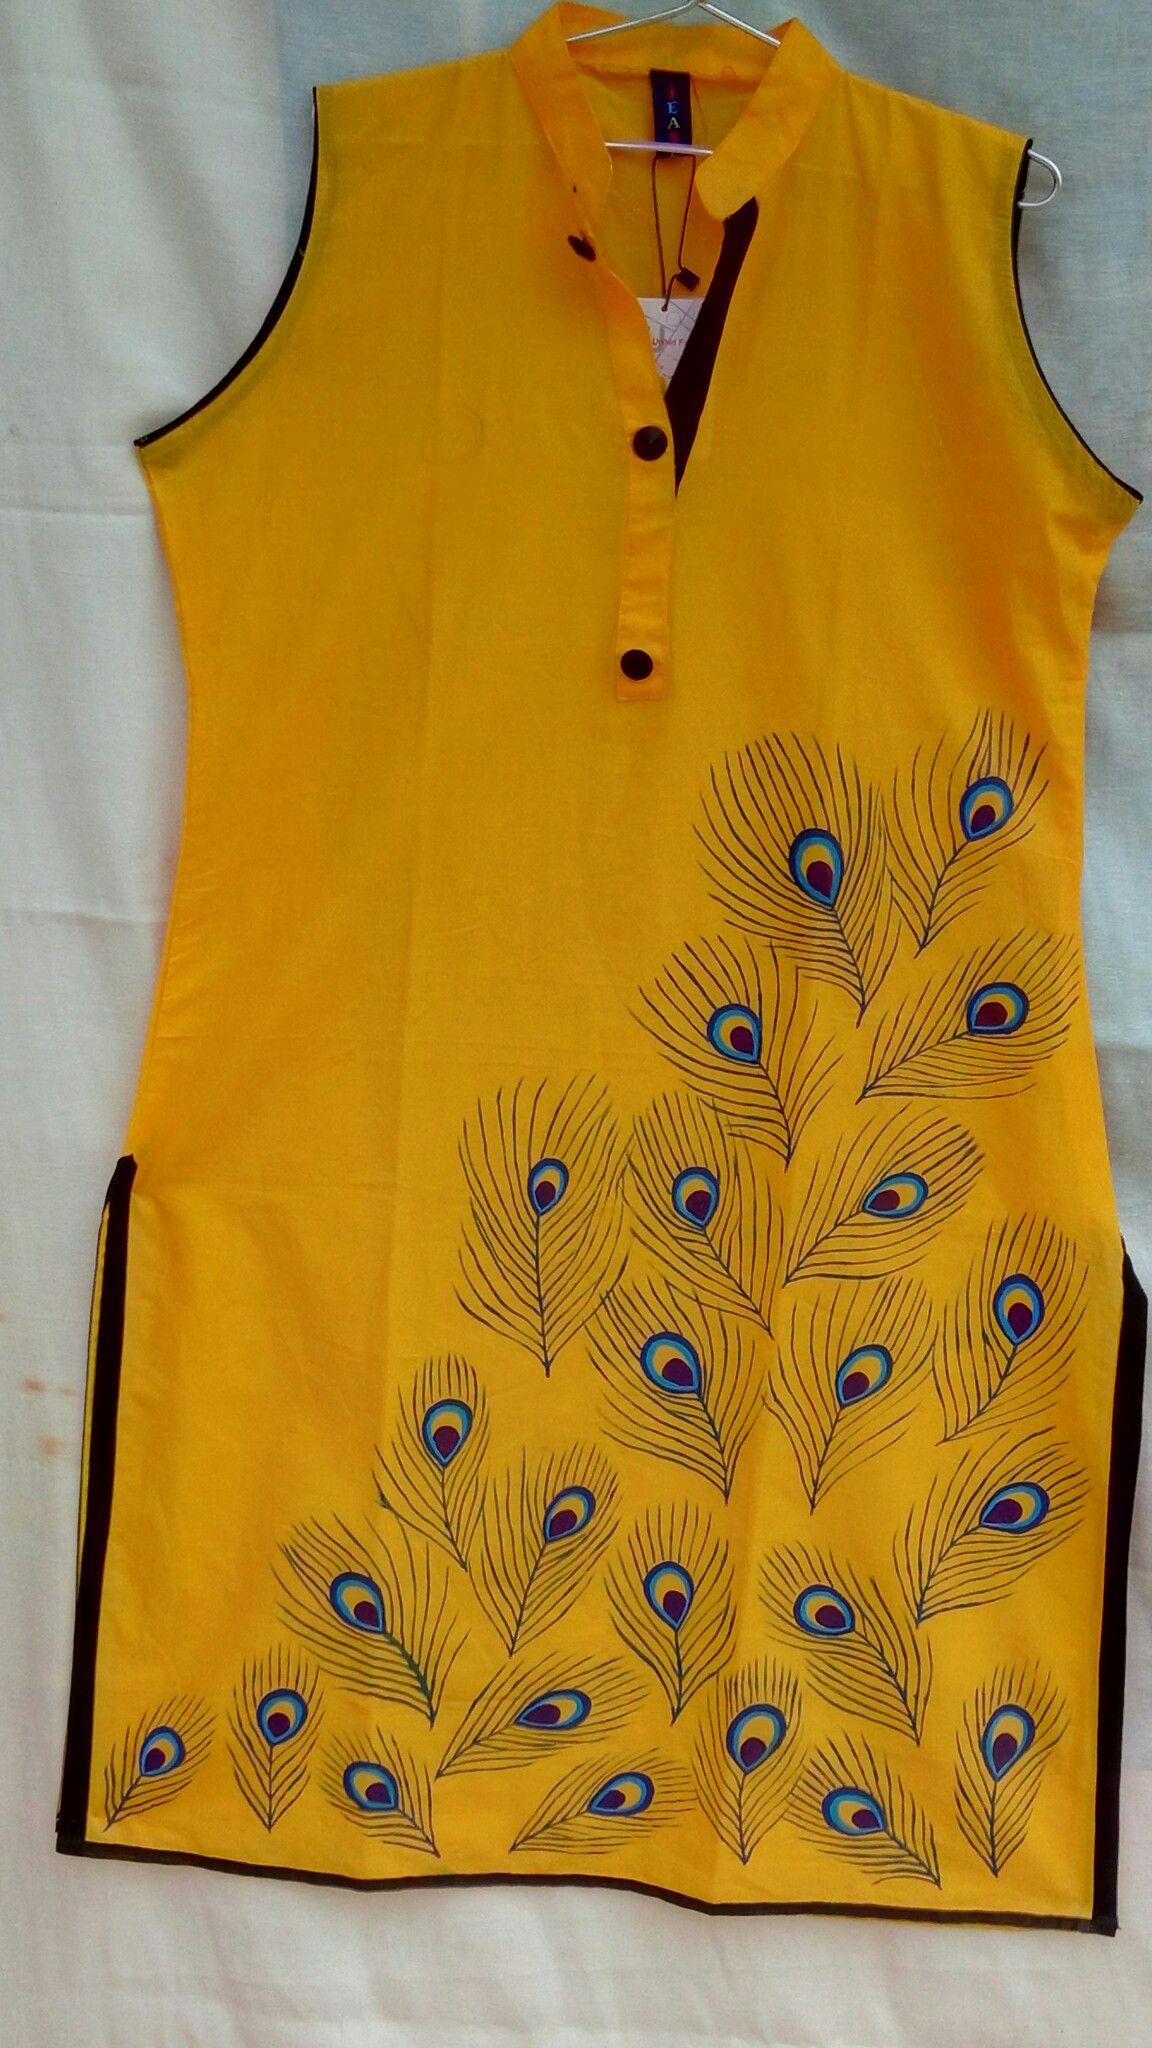 c45eb99d20 Fabric hand painted kurti. Size - xl,100%cotton, length 42